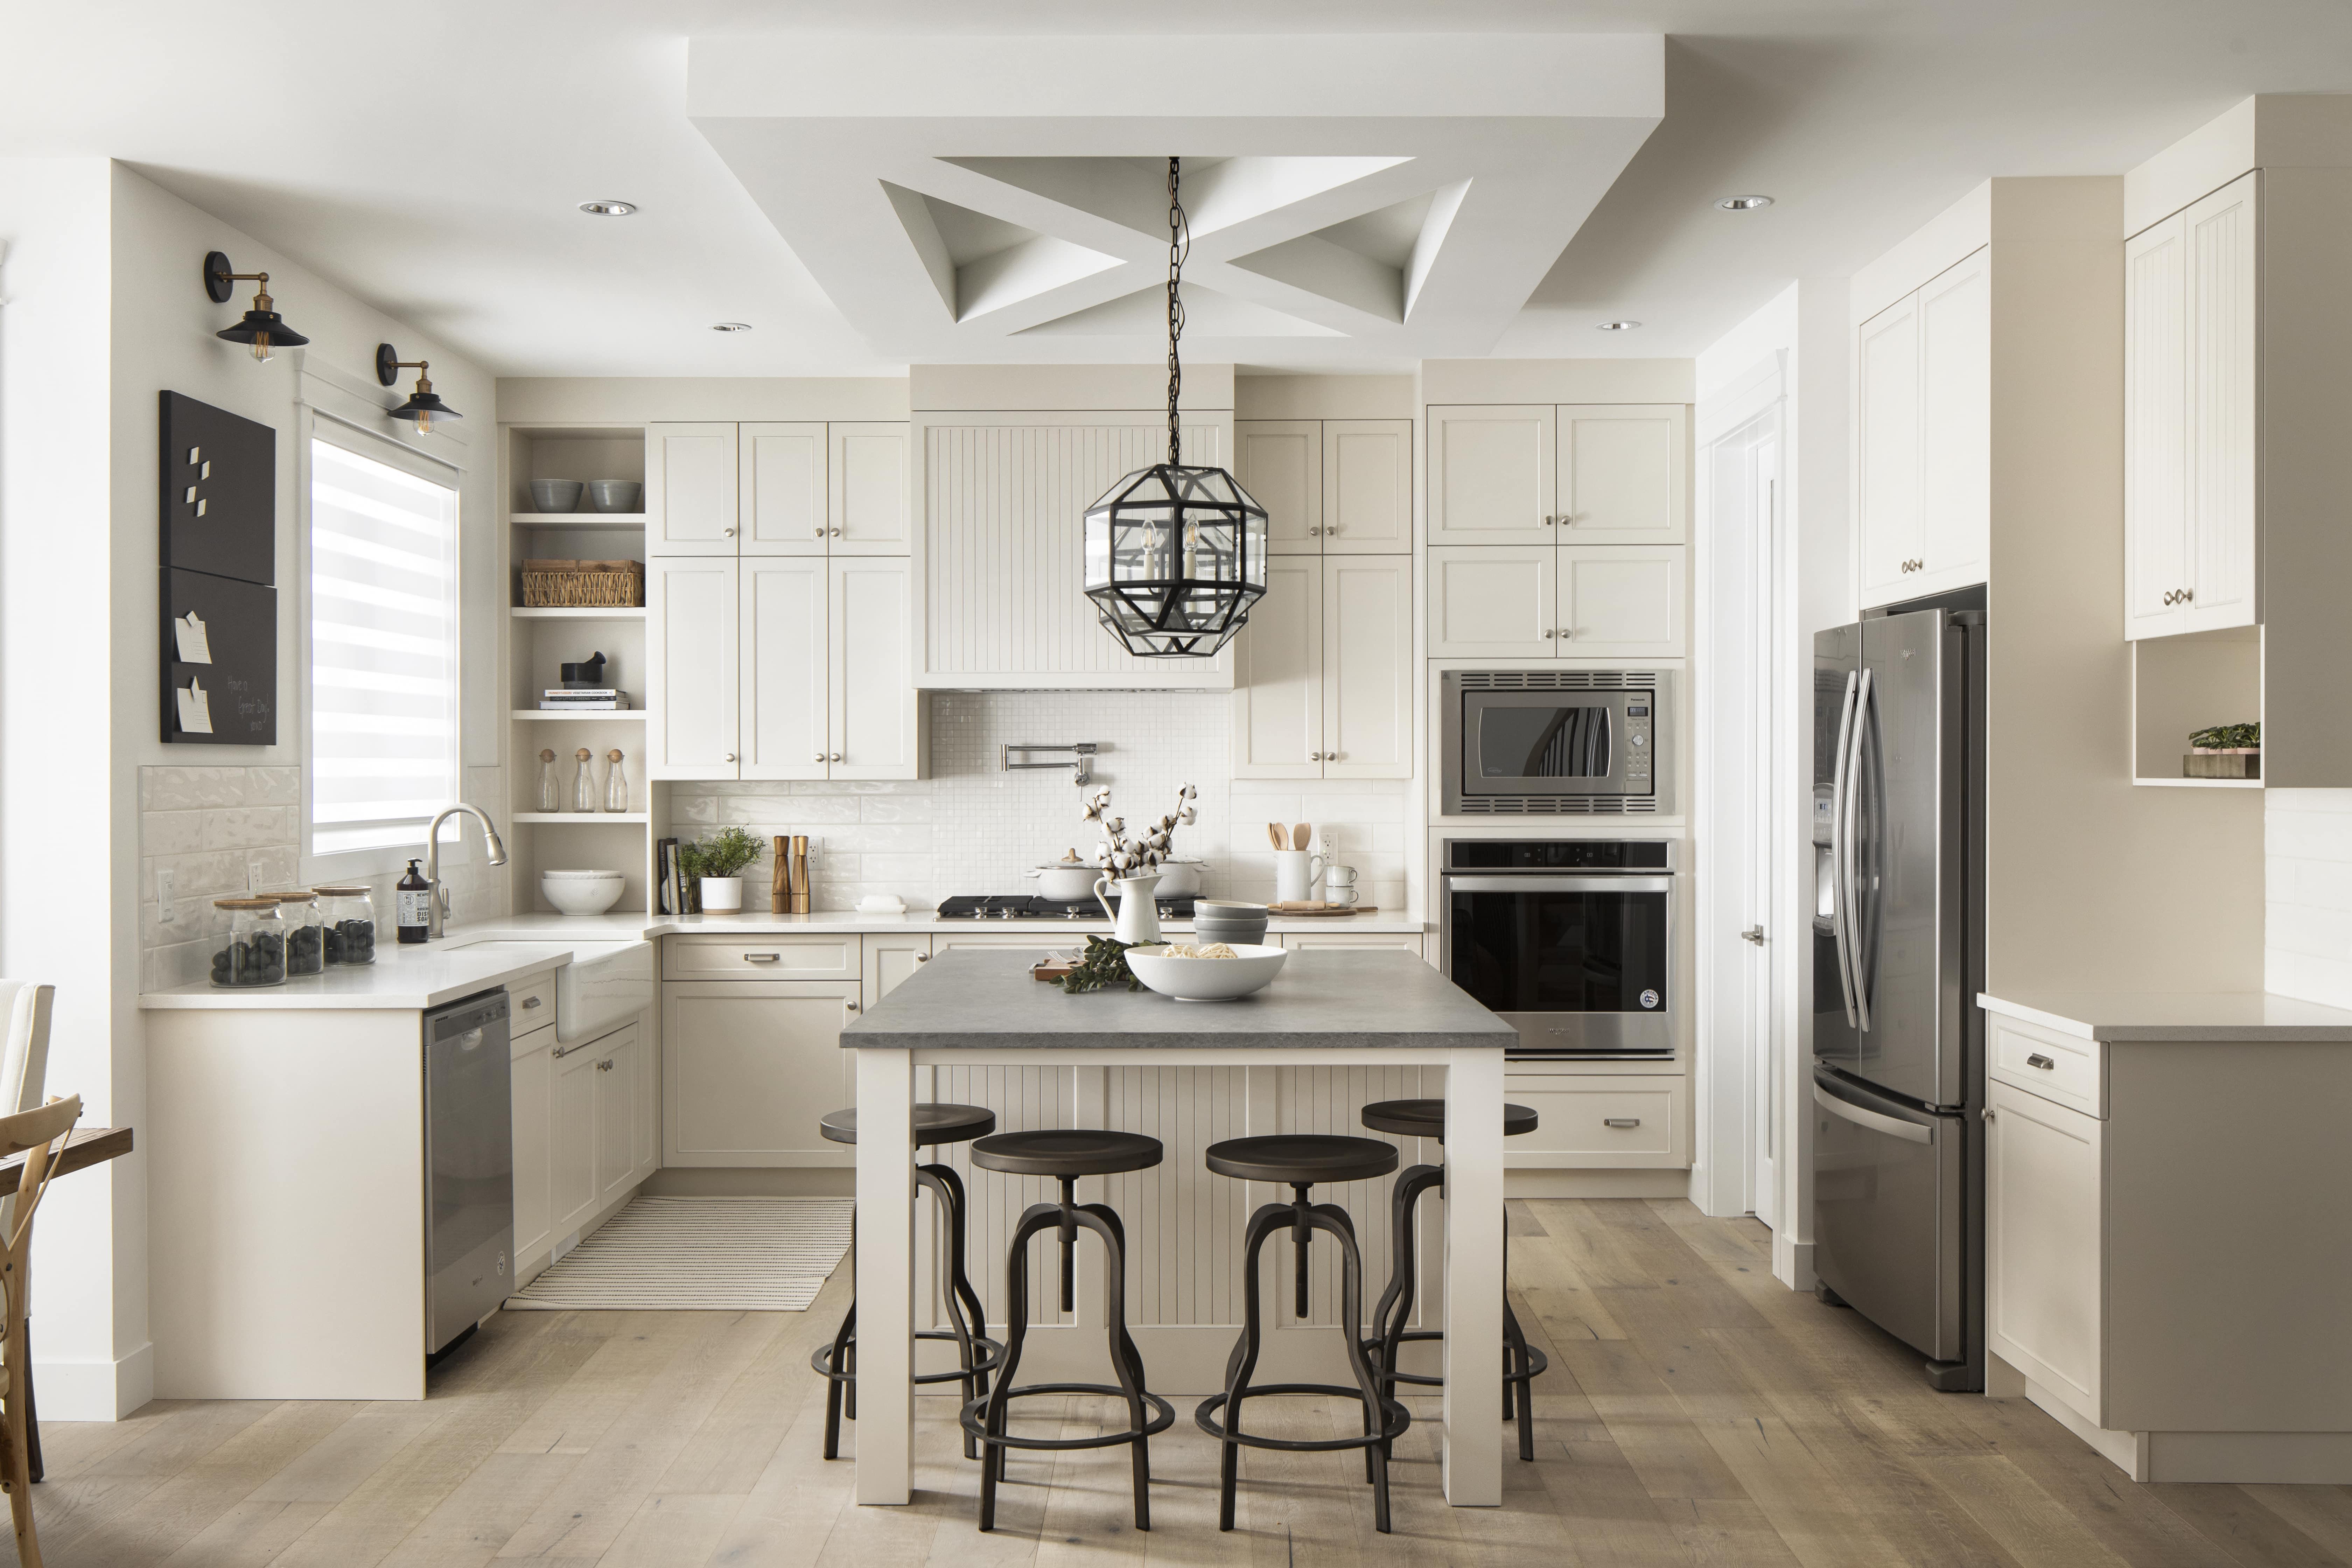 Luxuria_Homes_Builder_Calgary_Airdrie_Edmonton_Chestermere_Strathmore11-min